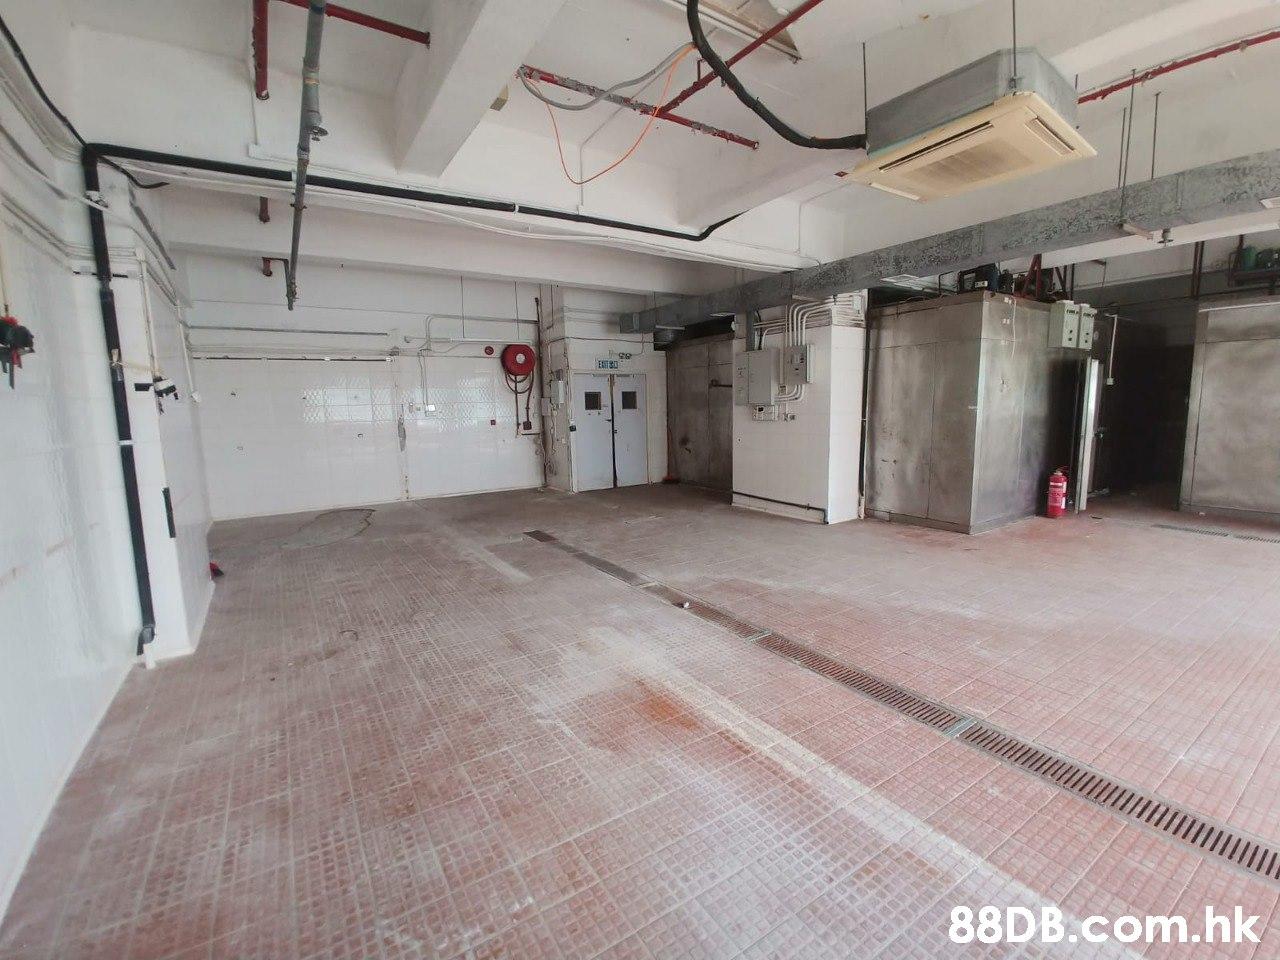 ENIT .hk  Property,Floor,Building,Flooring,Room